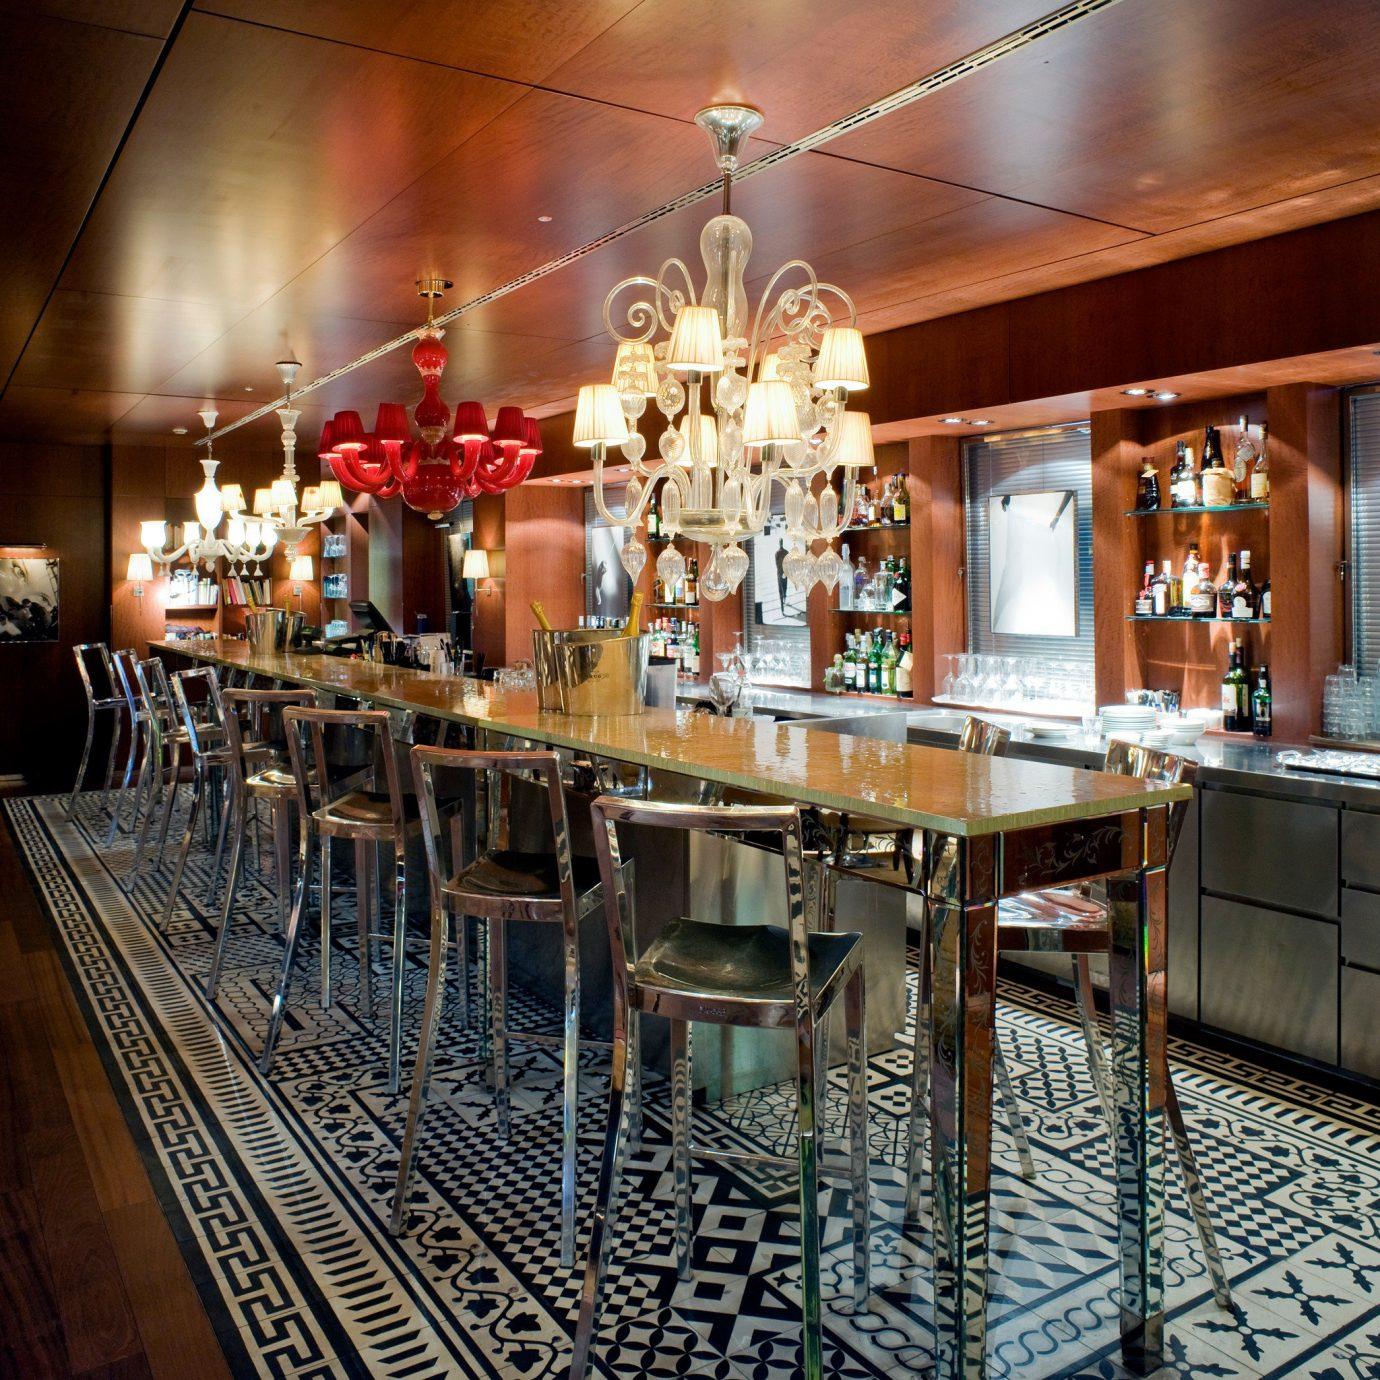 Bar City Drink Hip Hotels Italy Luxury Luxury Travel Venice Kitchen restaurant cooking